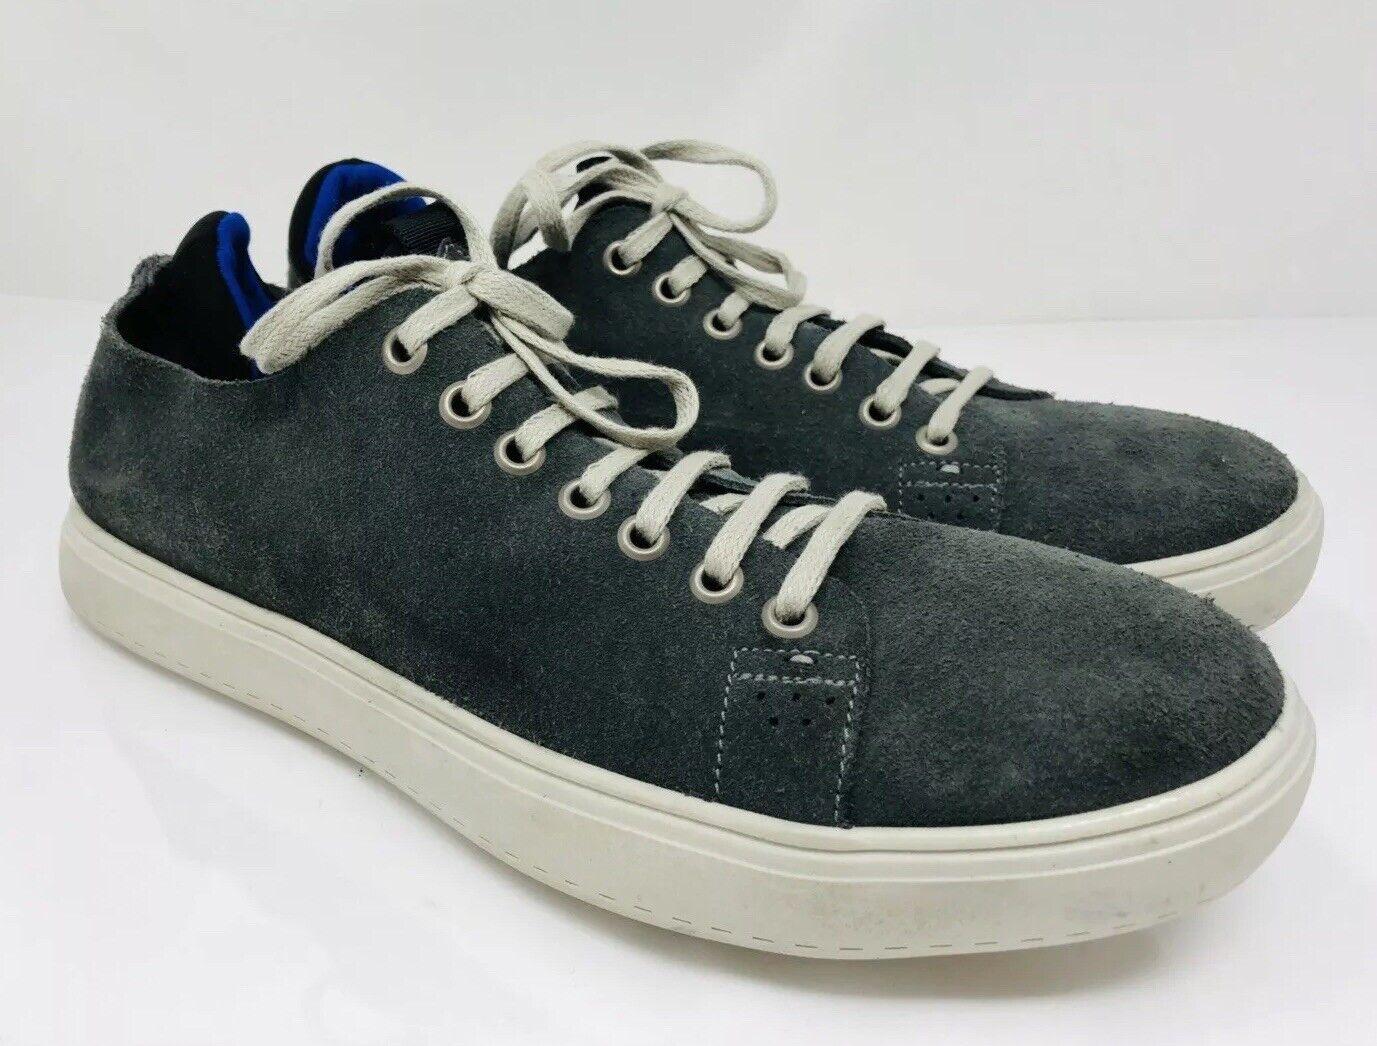 Donald J Pliner Men's Pierce Suede Sneaker Size 8M Grey, MSRP